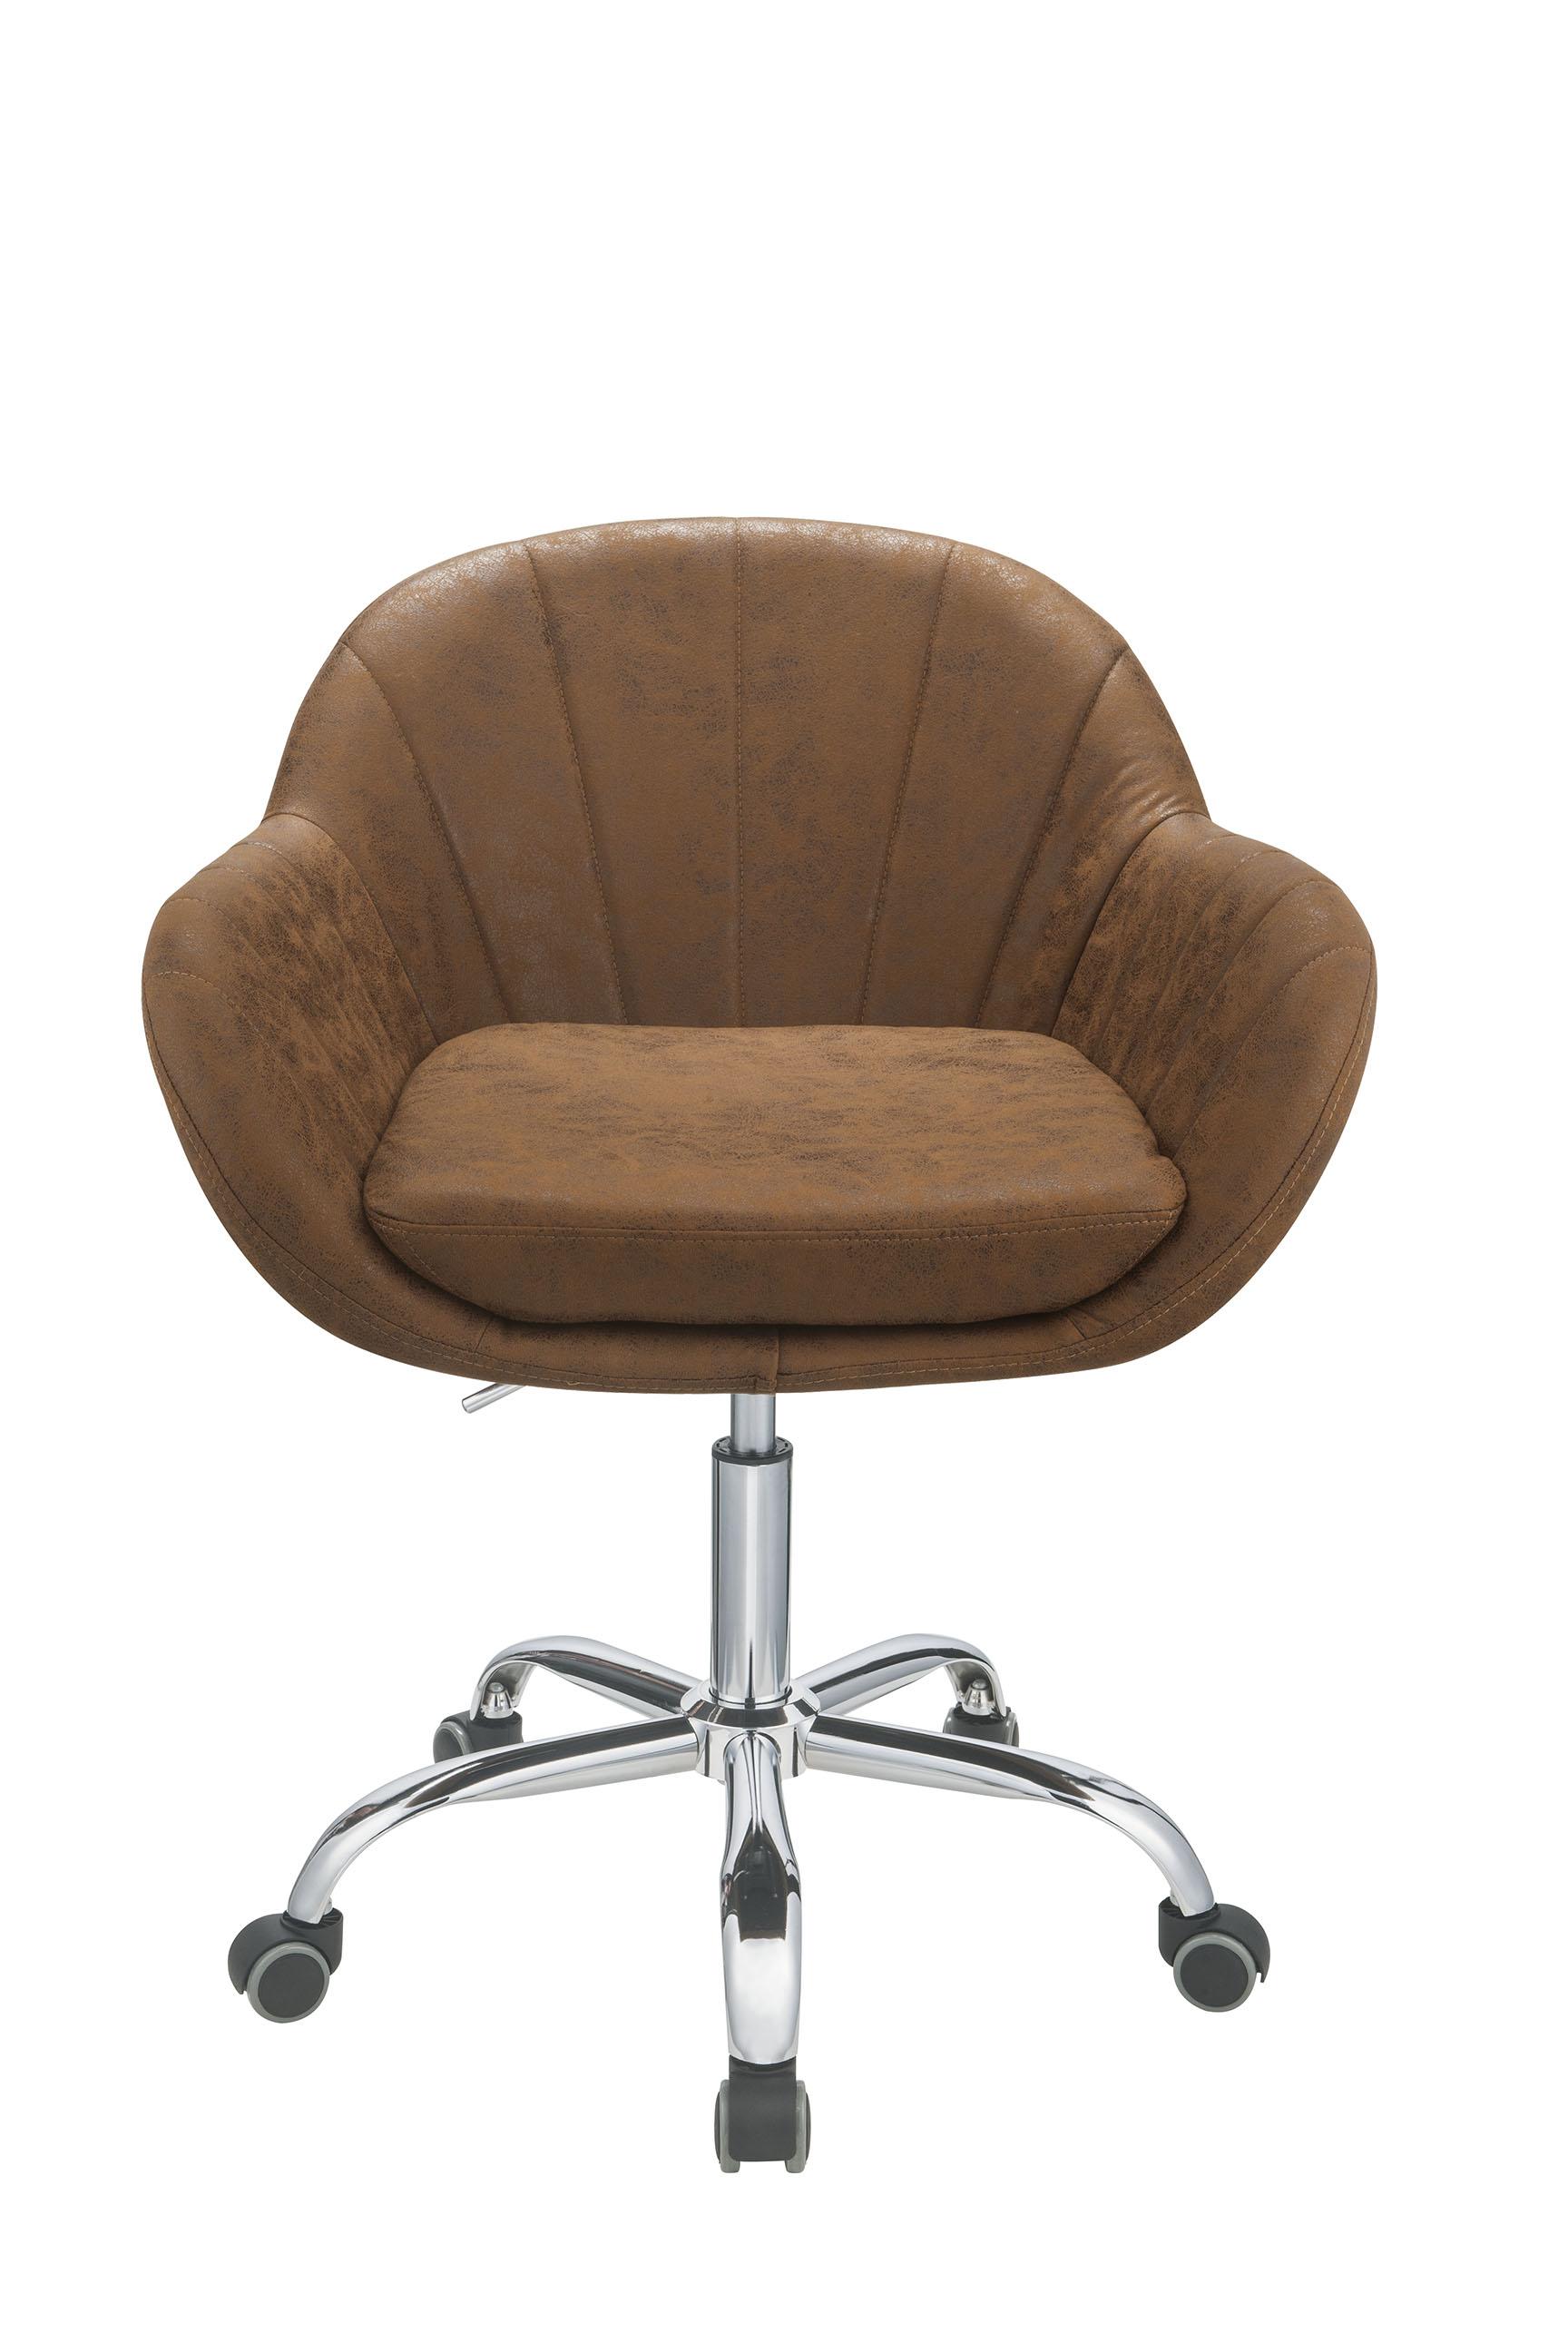 "28"" X 27"" X 31"" Brown Metal Tube Office Chair"